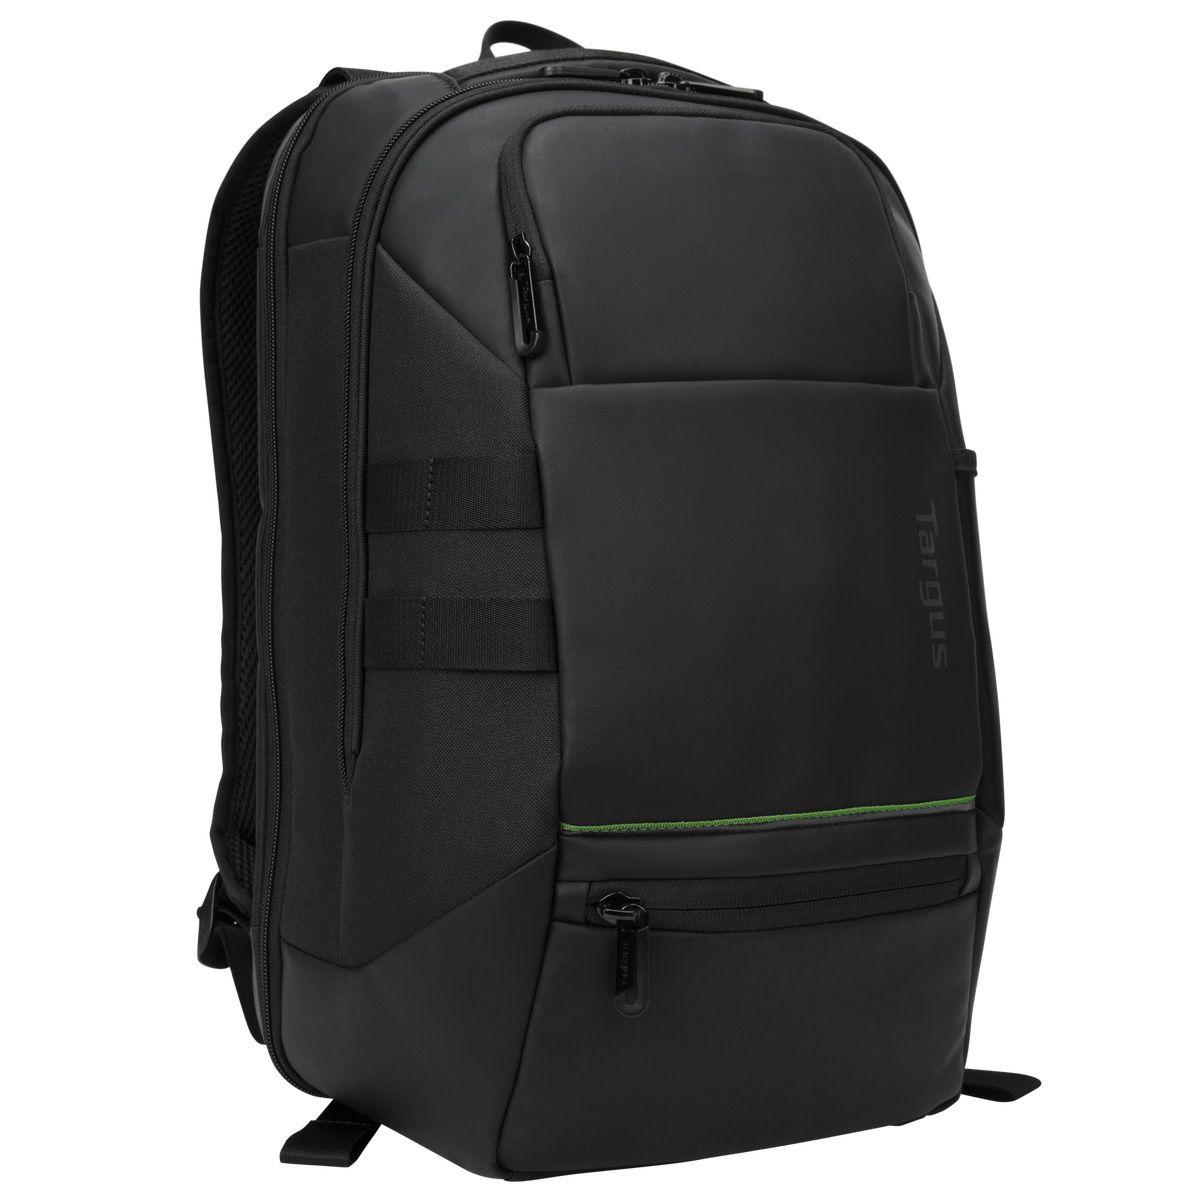 Eco Smart Pro Laptop Backpack1